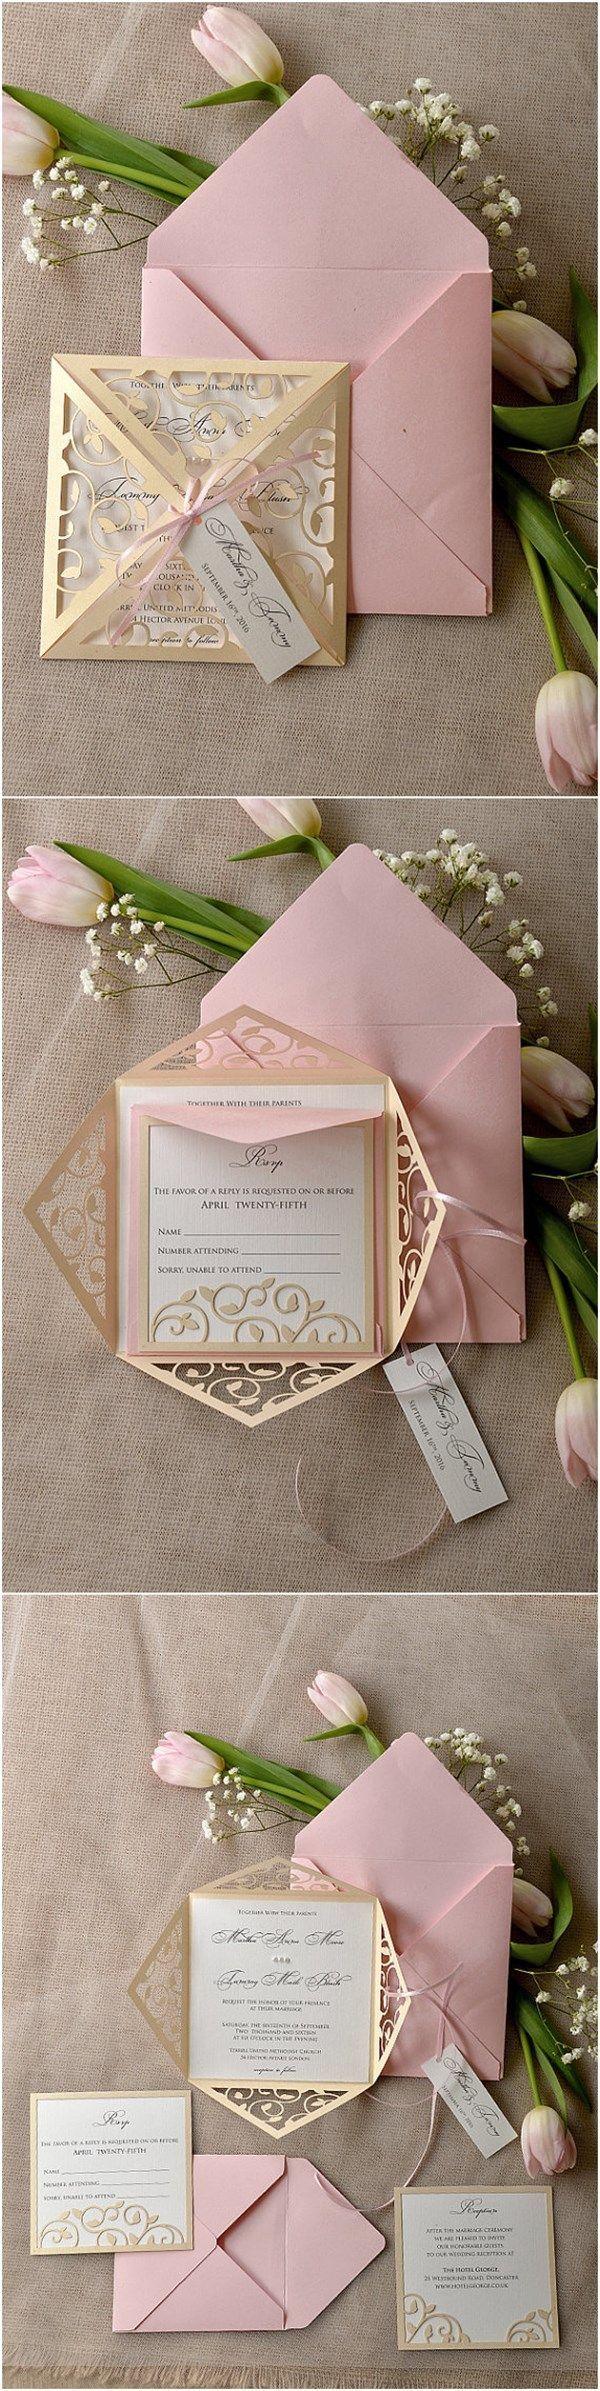 pink and gold wedding invitation kits%0A Houston Evacuation Map